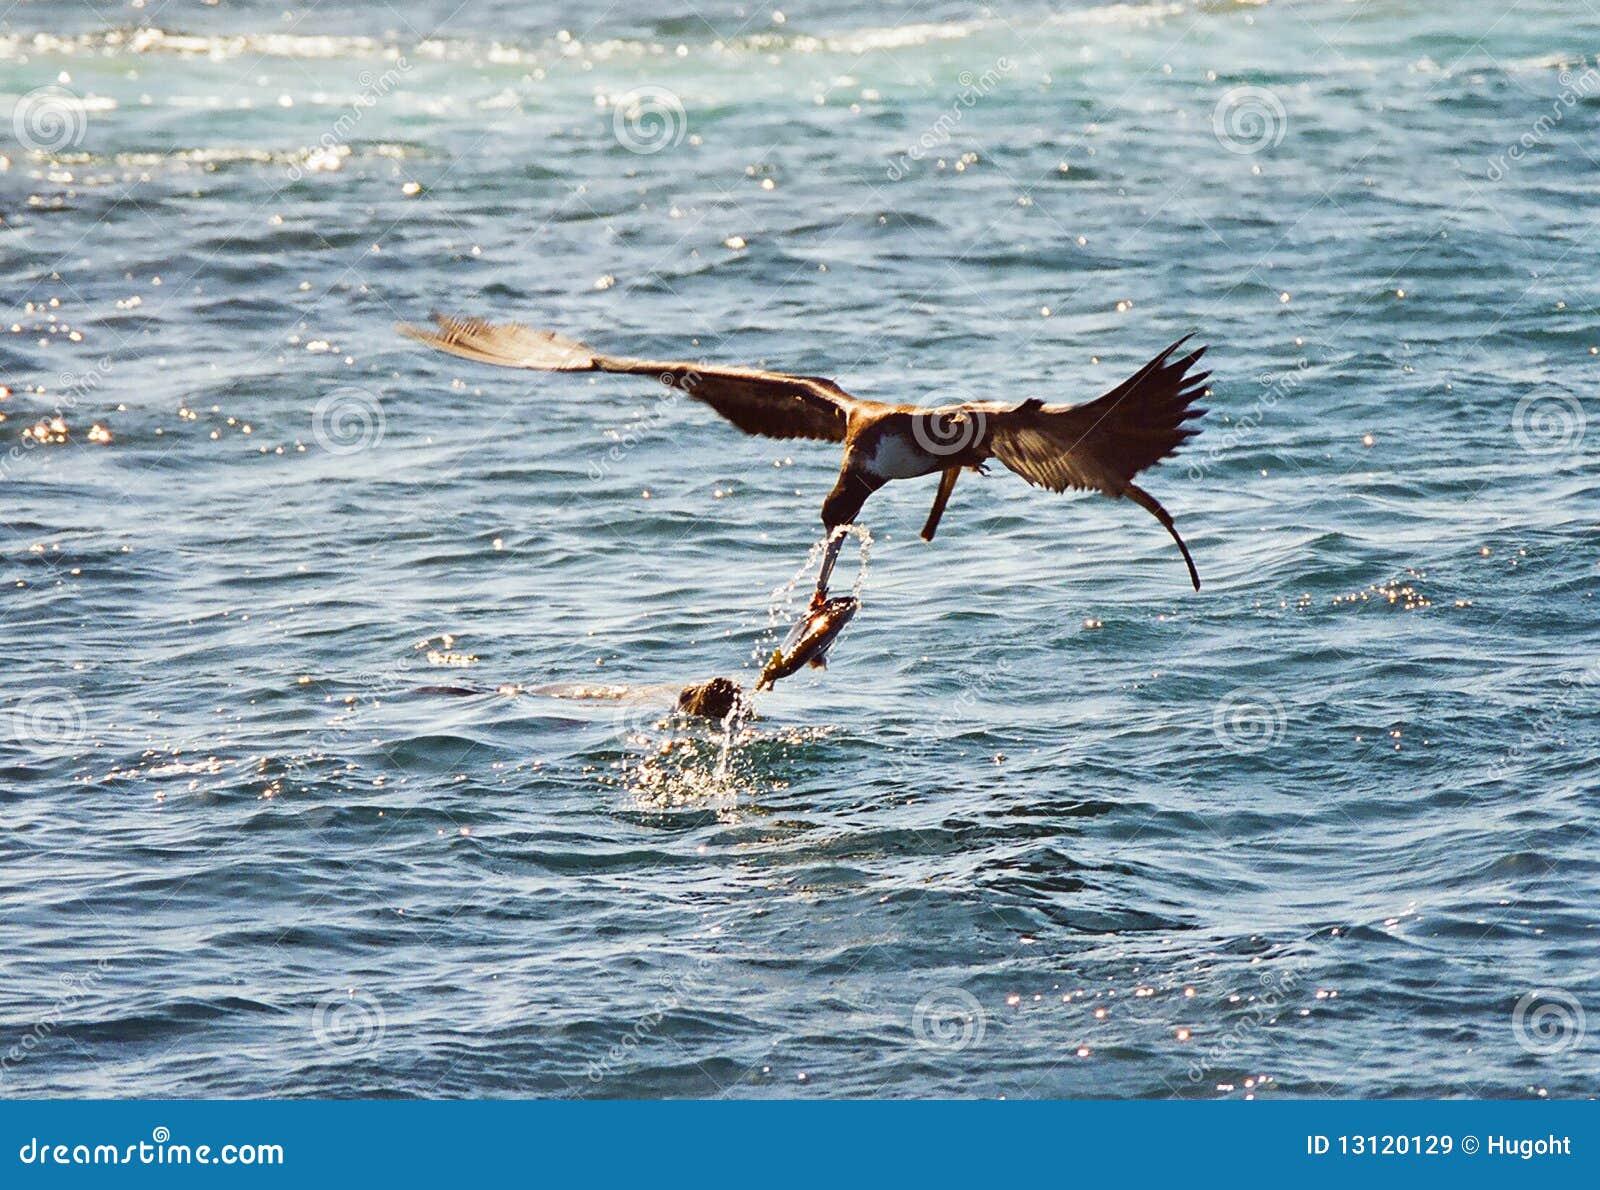 Galapagos animals fighting